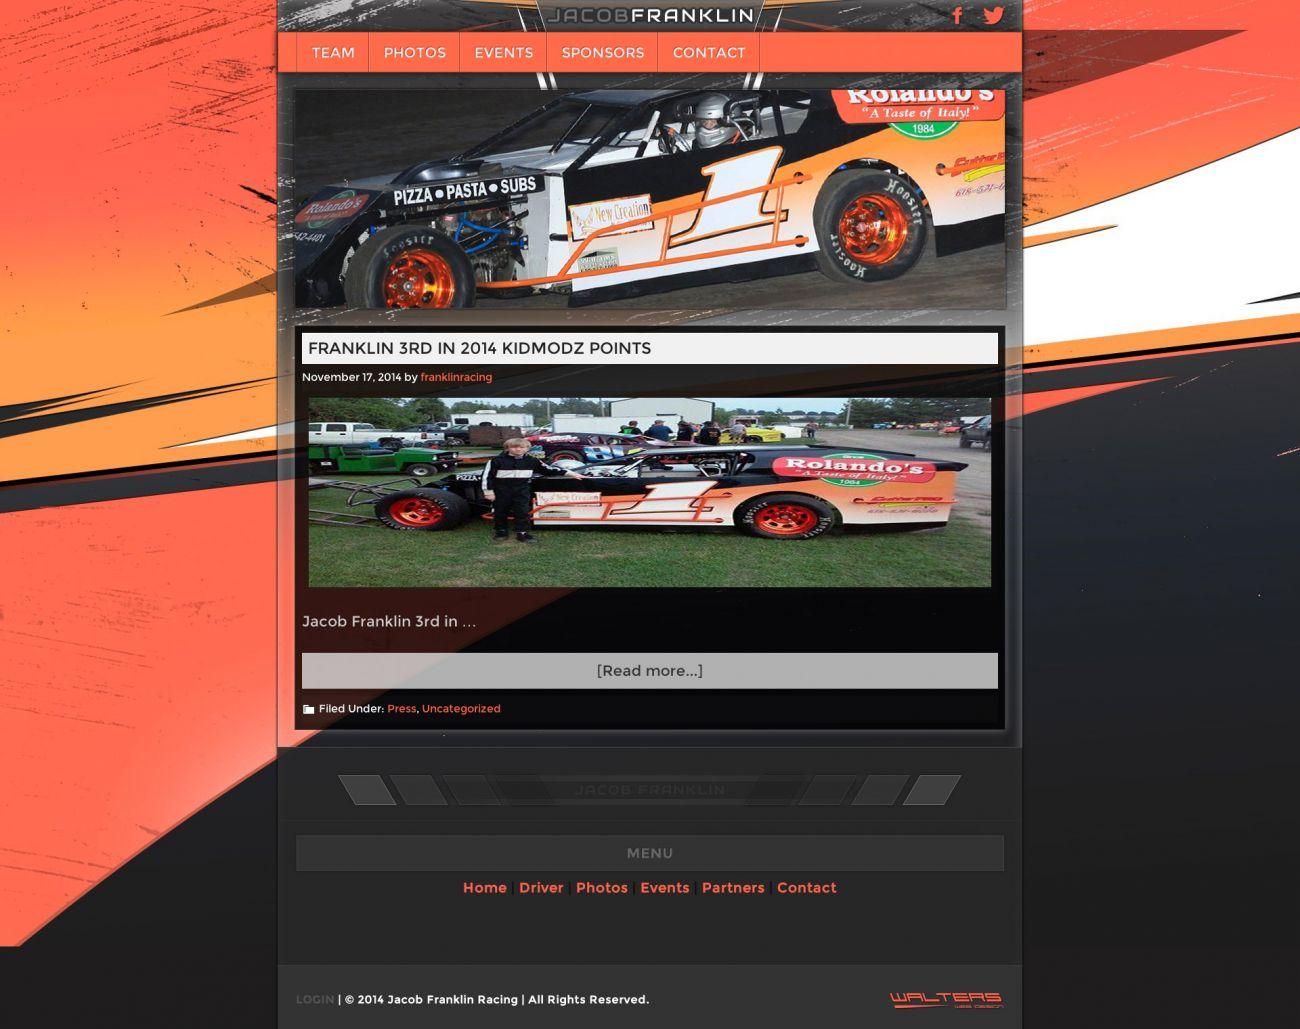 Jacob Franklin UMP KidModz Racing Series Driver Website Links - Walters Web Design